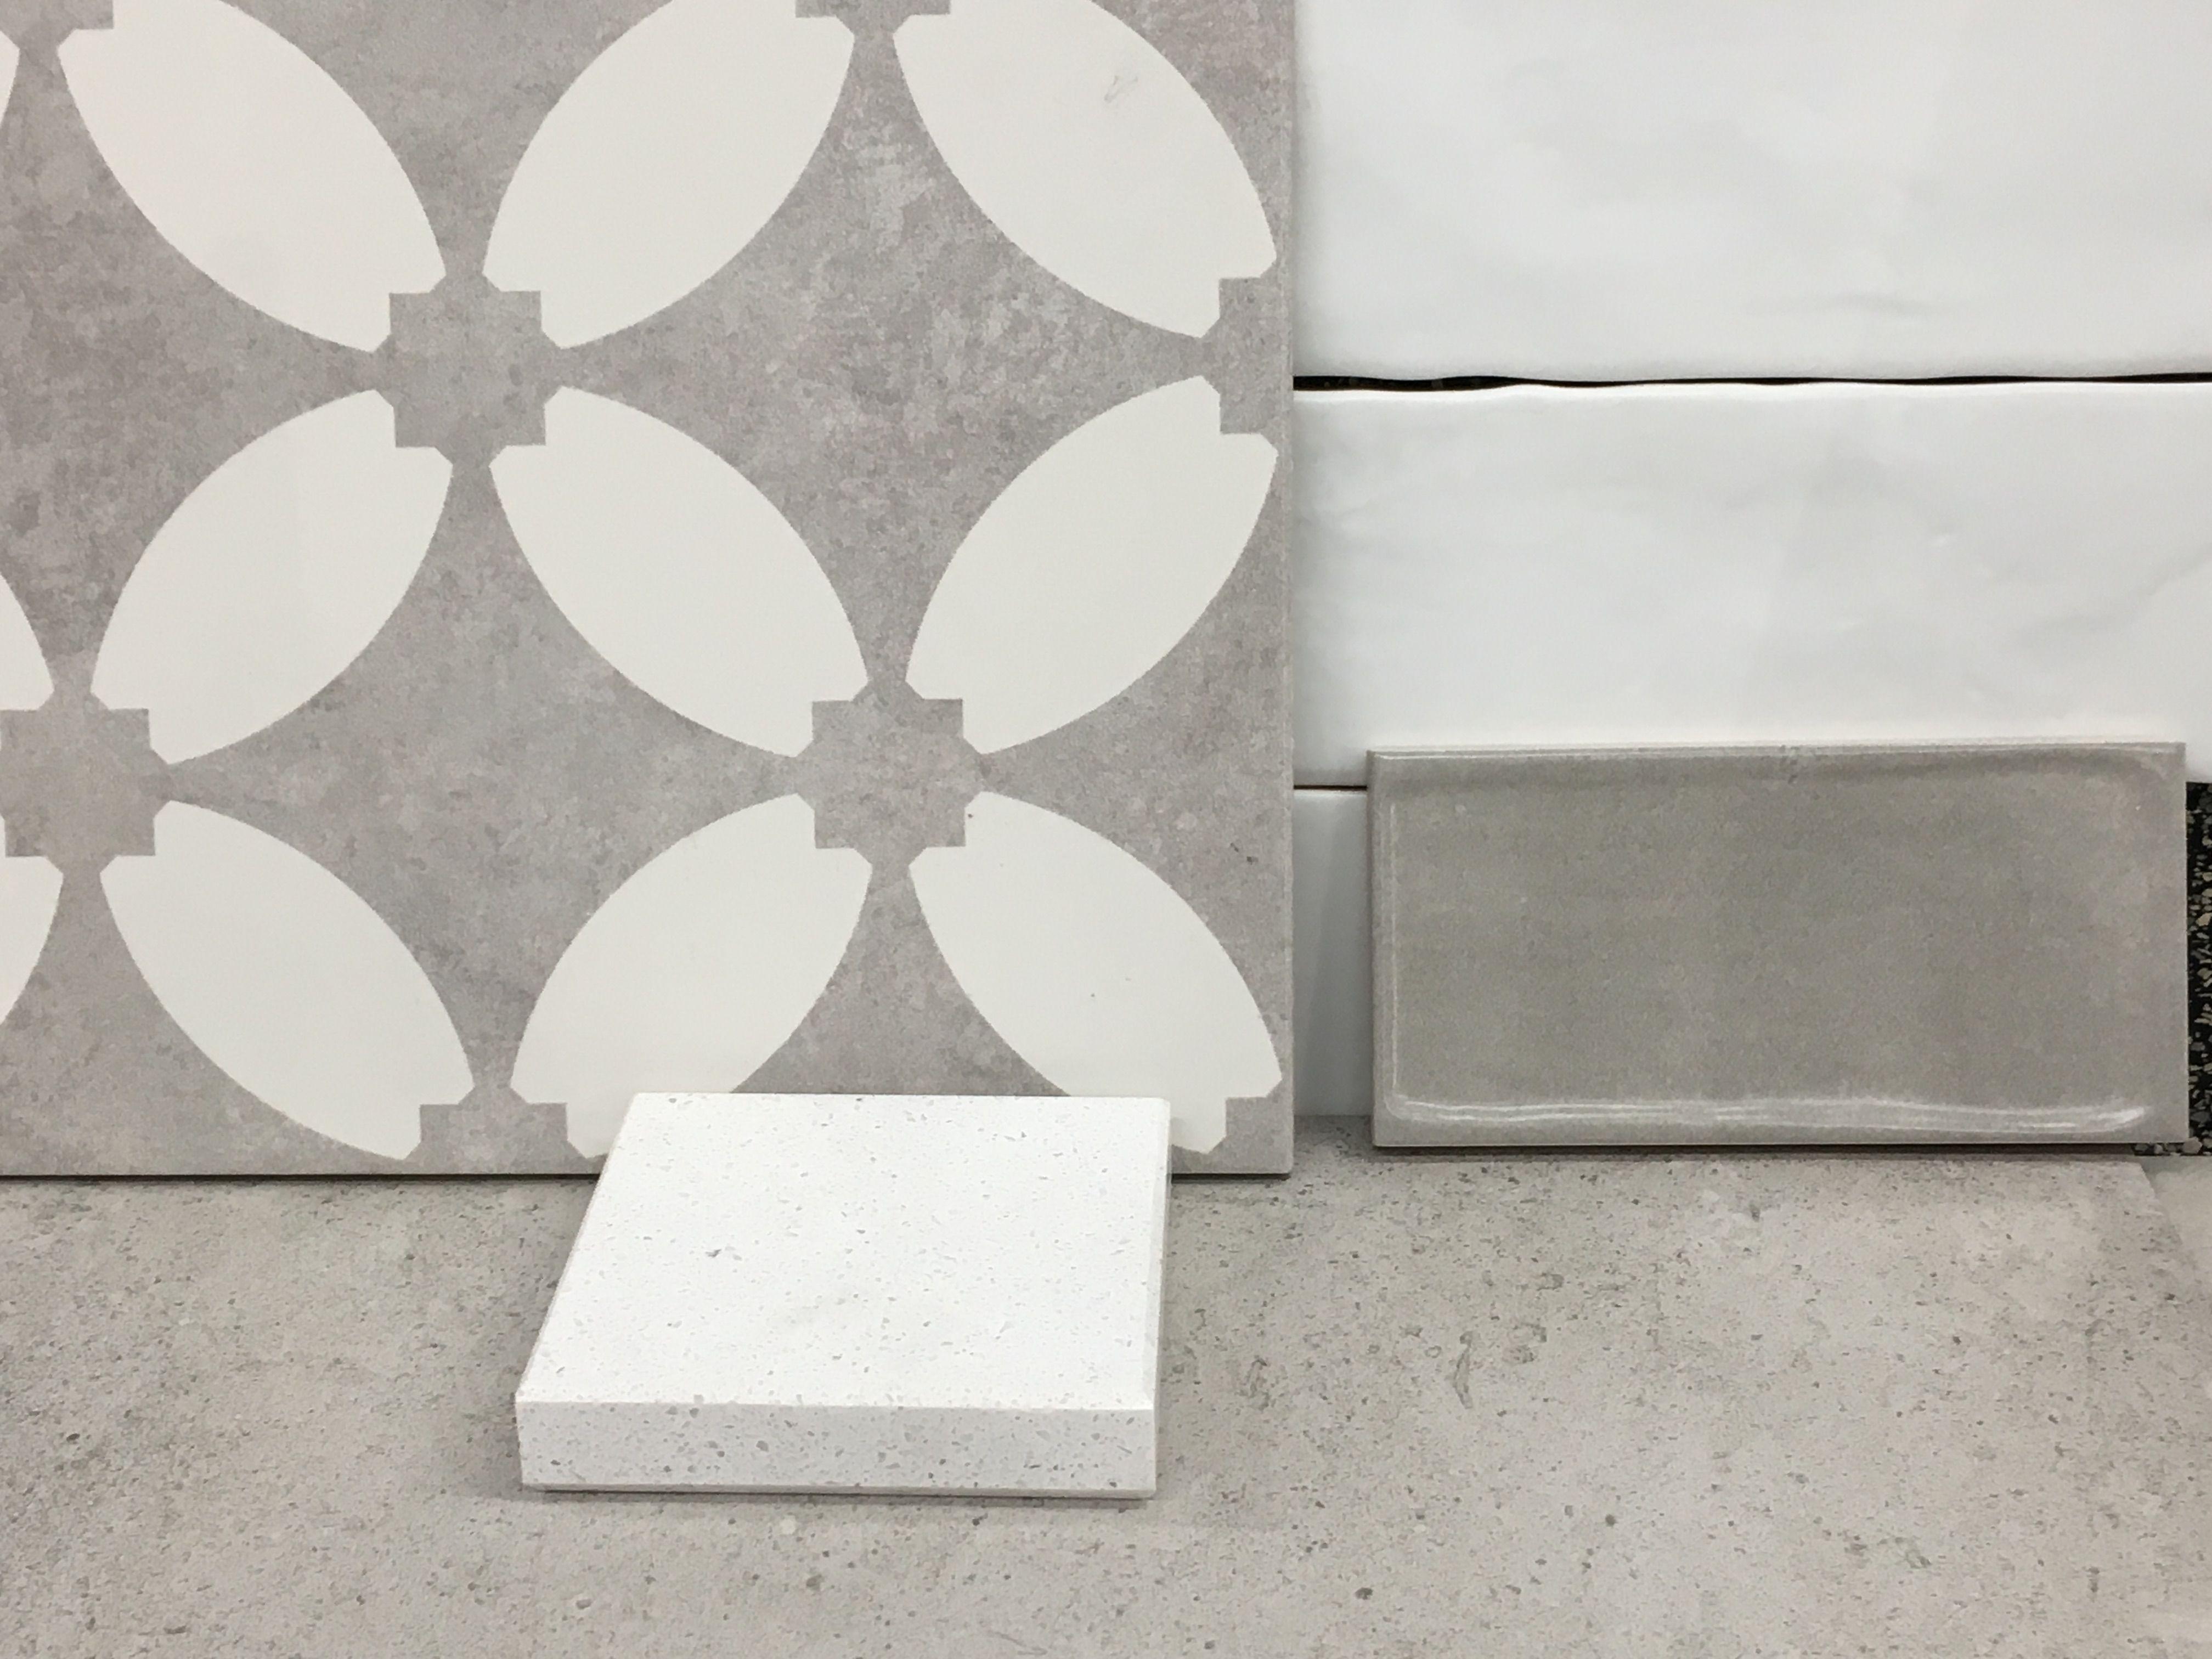 Tile selection from Beaumont tile studio | Jill Bar | Pinterest ...